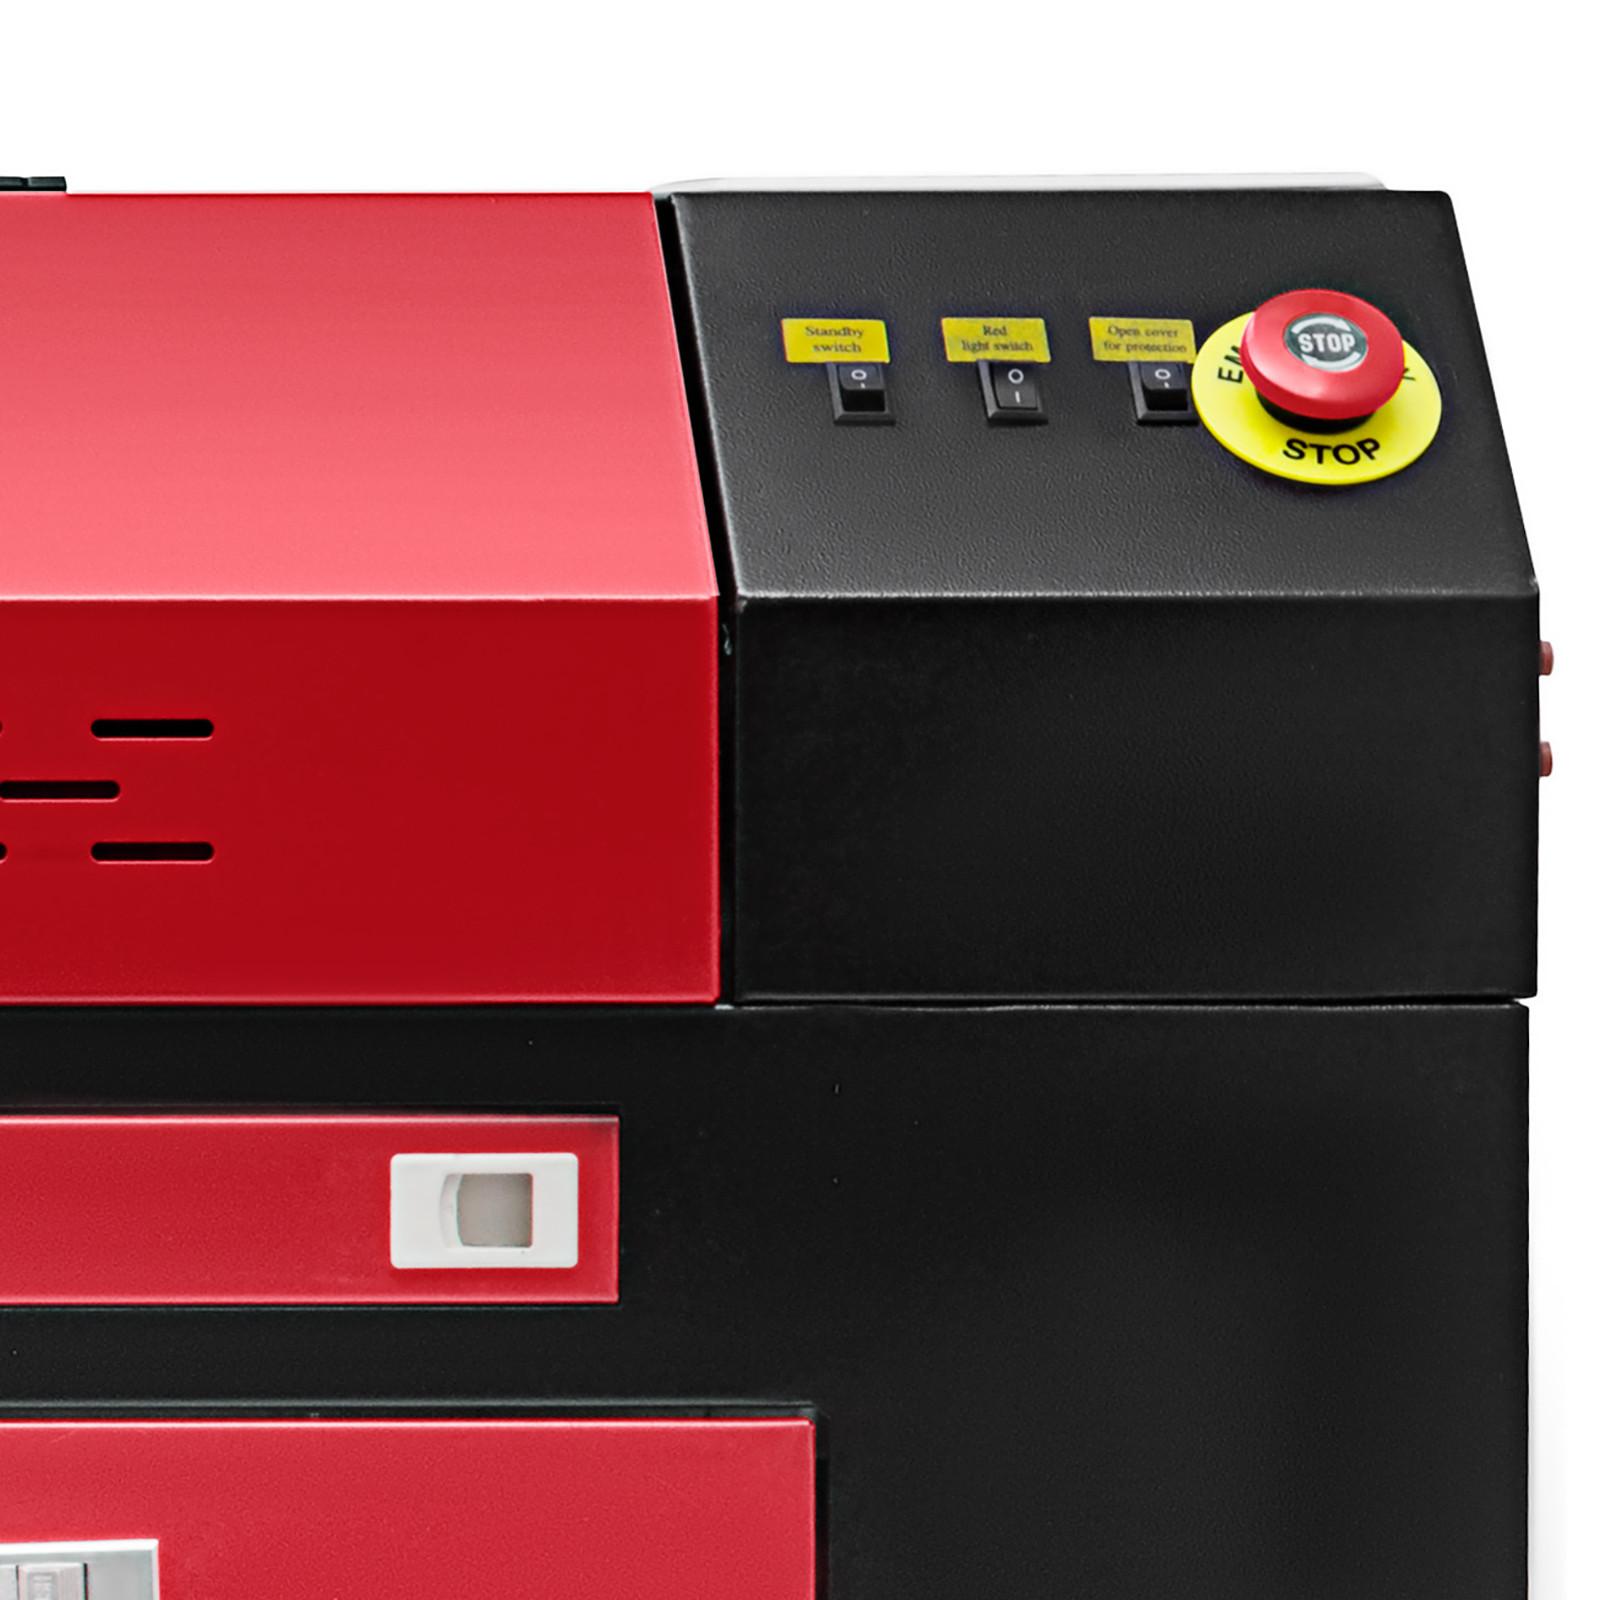 Macchina-per-Incisione-Laser-CO2-40-130W-Asse-Rotante-Tagliatrice-Incisore miniatura 57